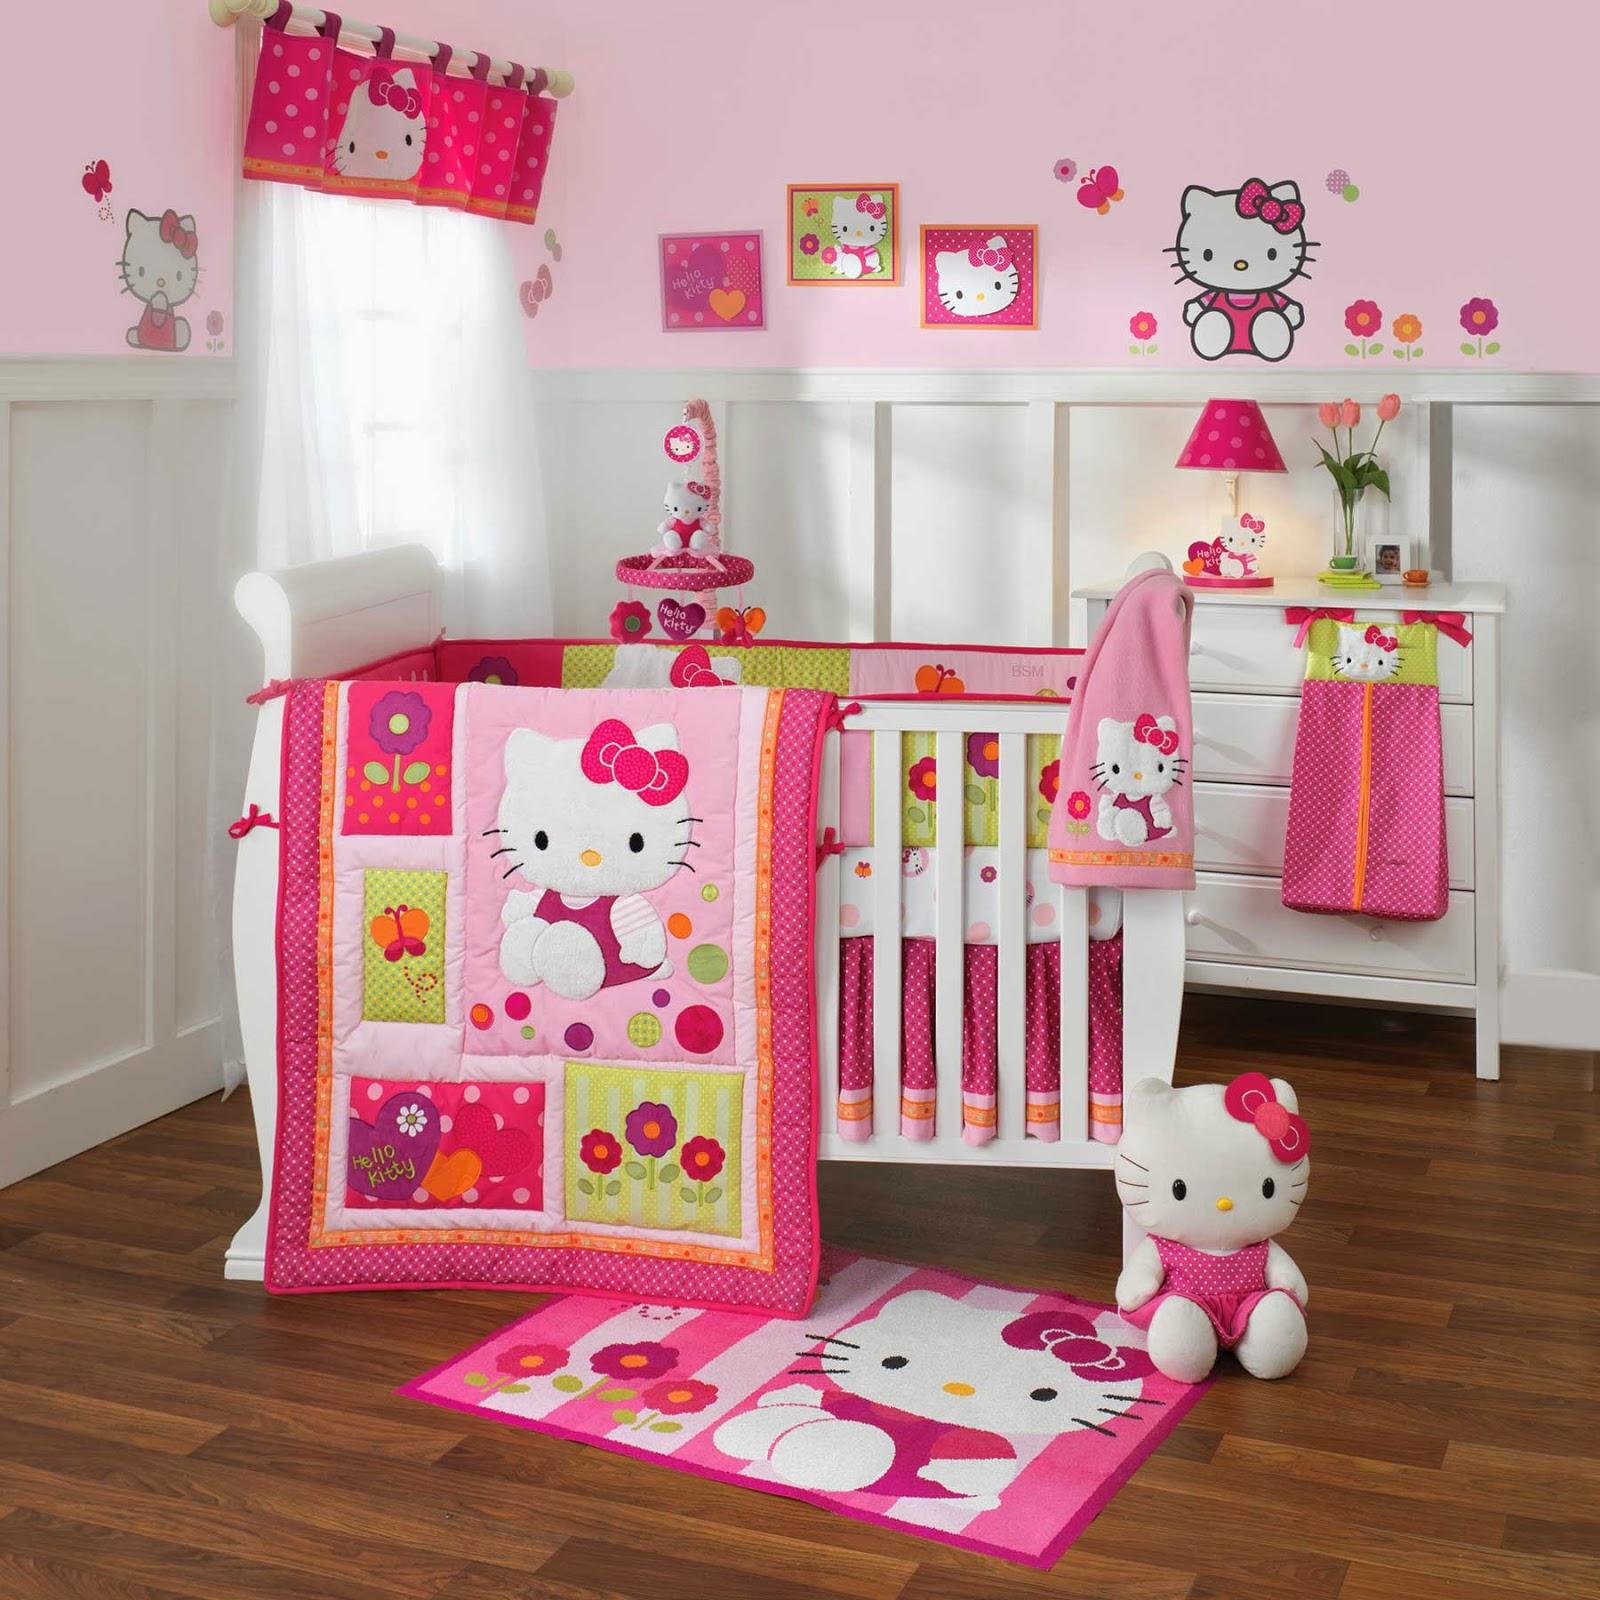 Hello Kitty Themed Baby Bedroom Geeks Fashion